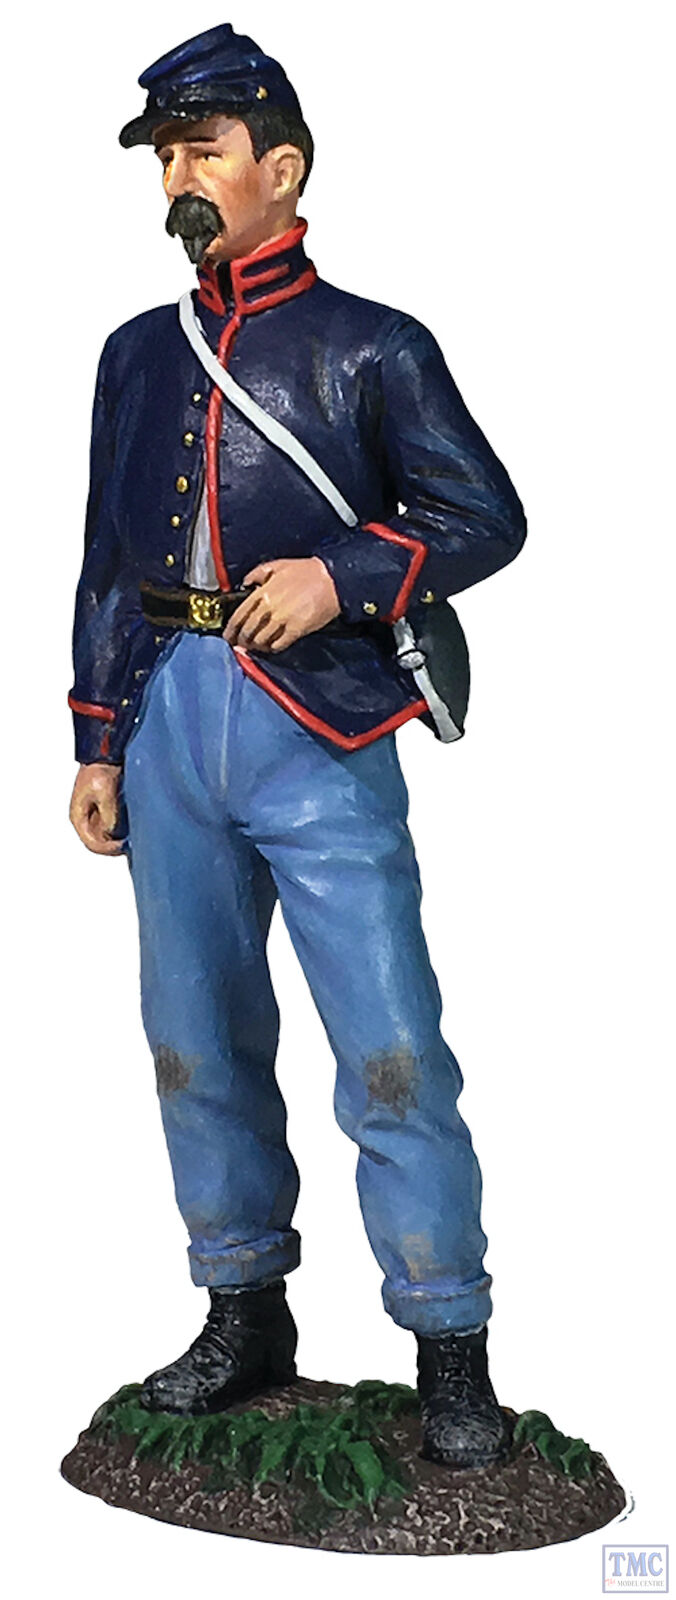 B31283 W.Britain Federal Artilleryman Standing with Hand on Belt